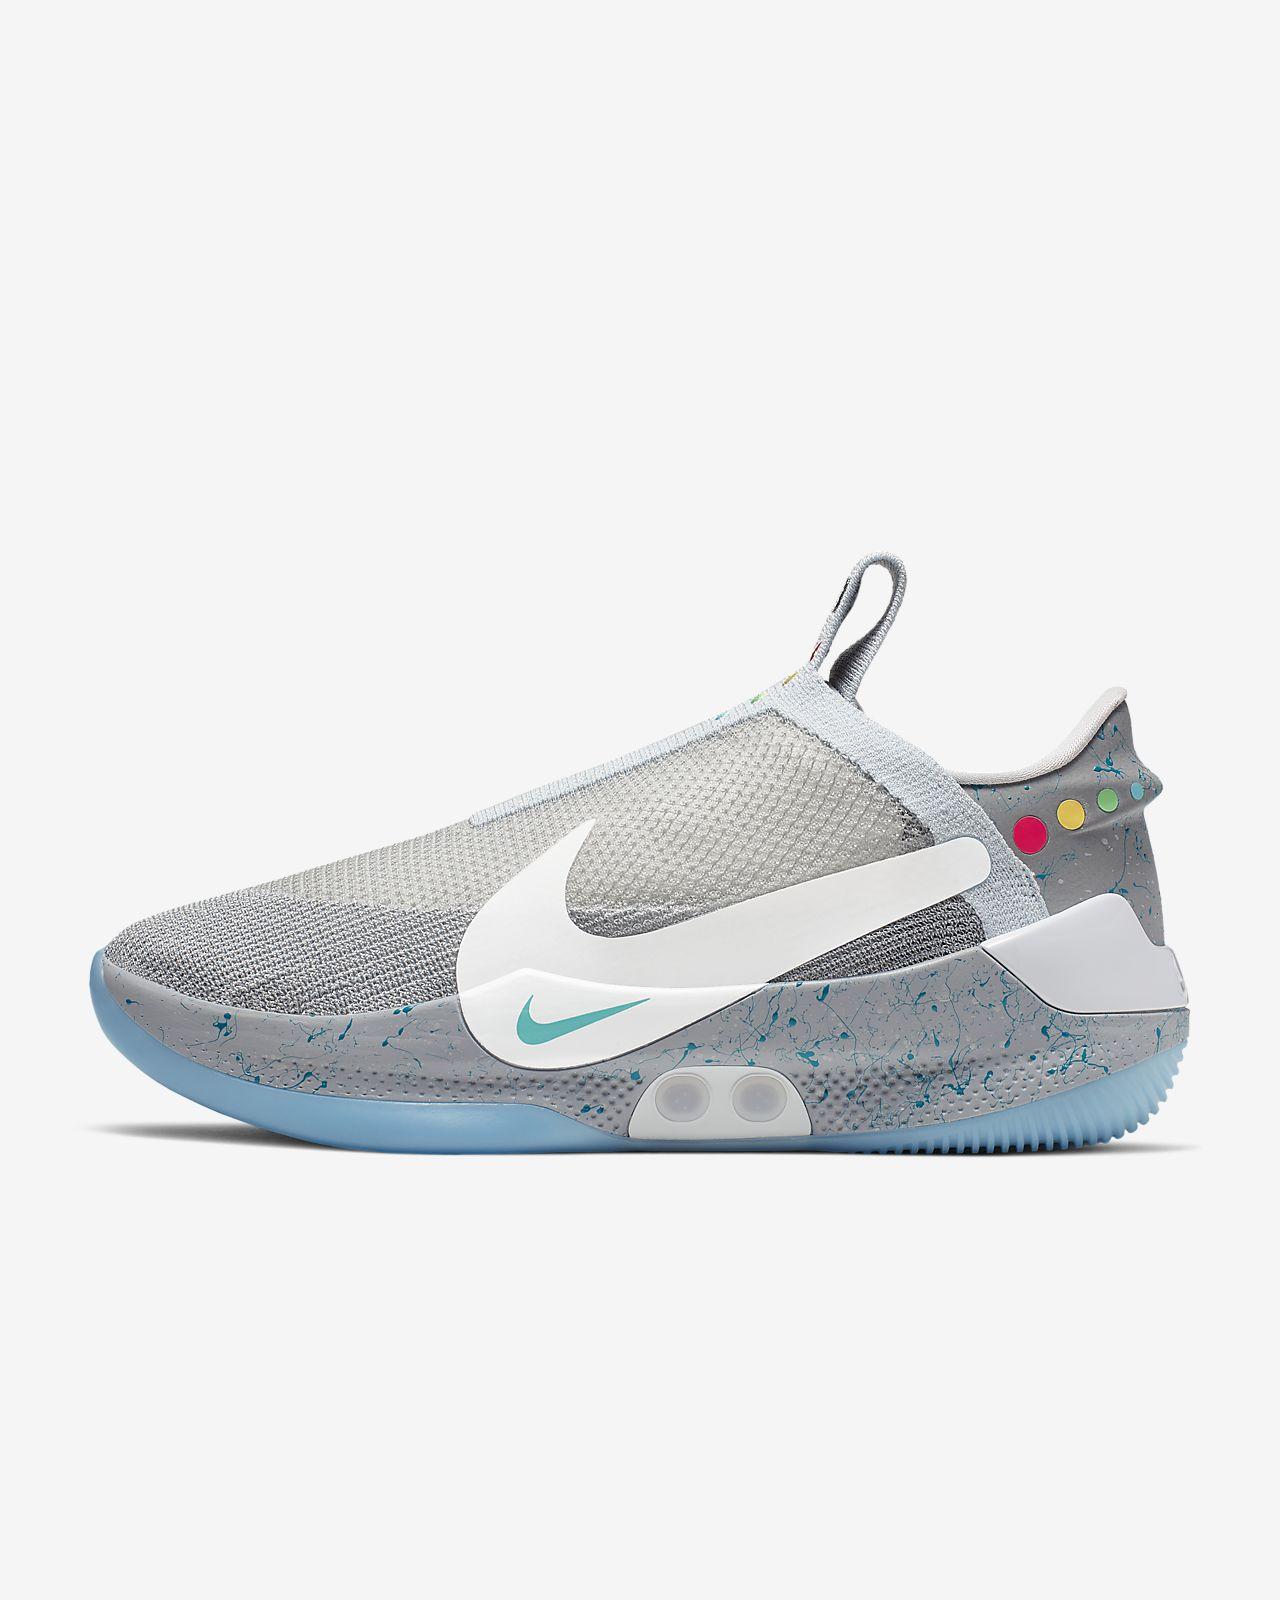 Nike Adapt BB Basketbalschoen